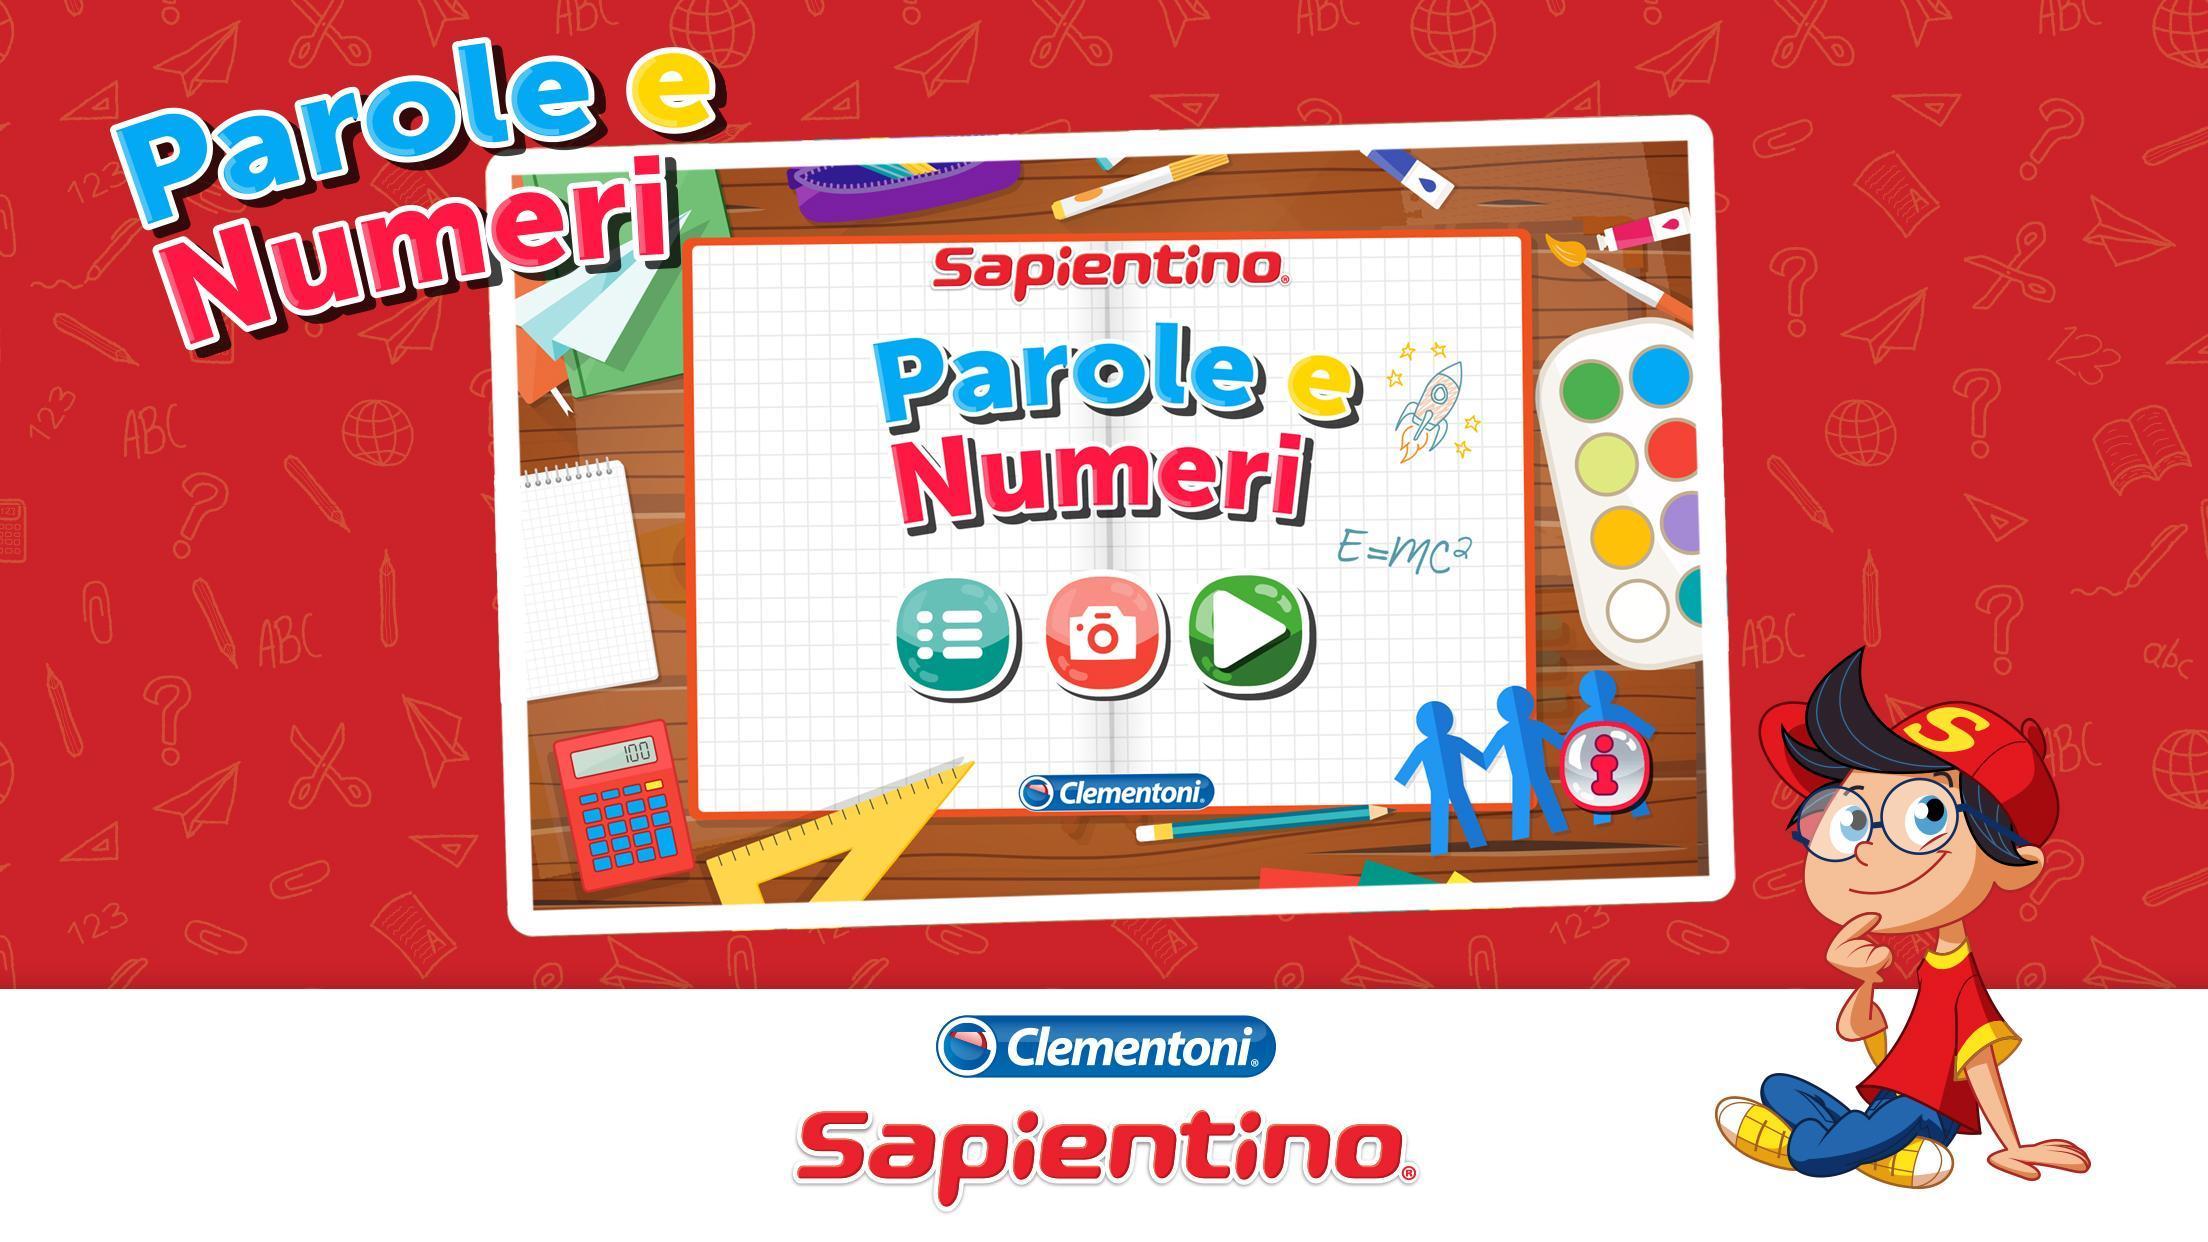 Sapientino Parole e Numeri 1.0 Screenshot 1